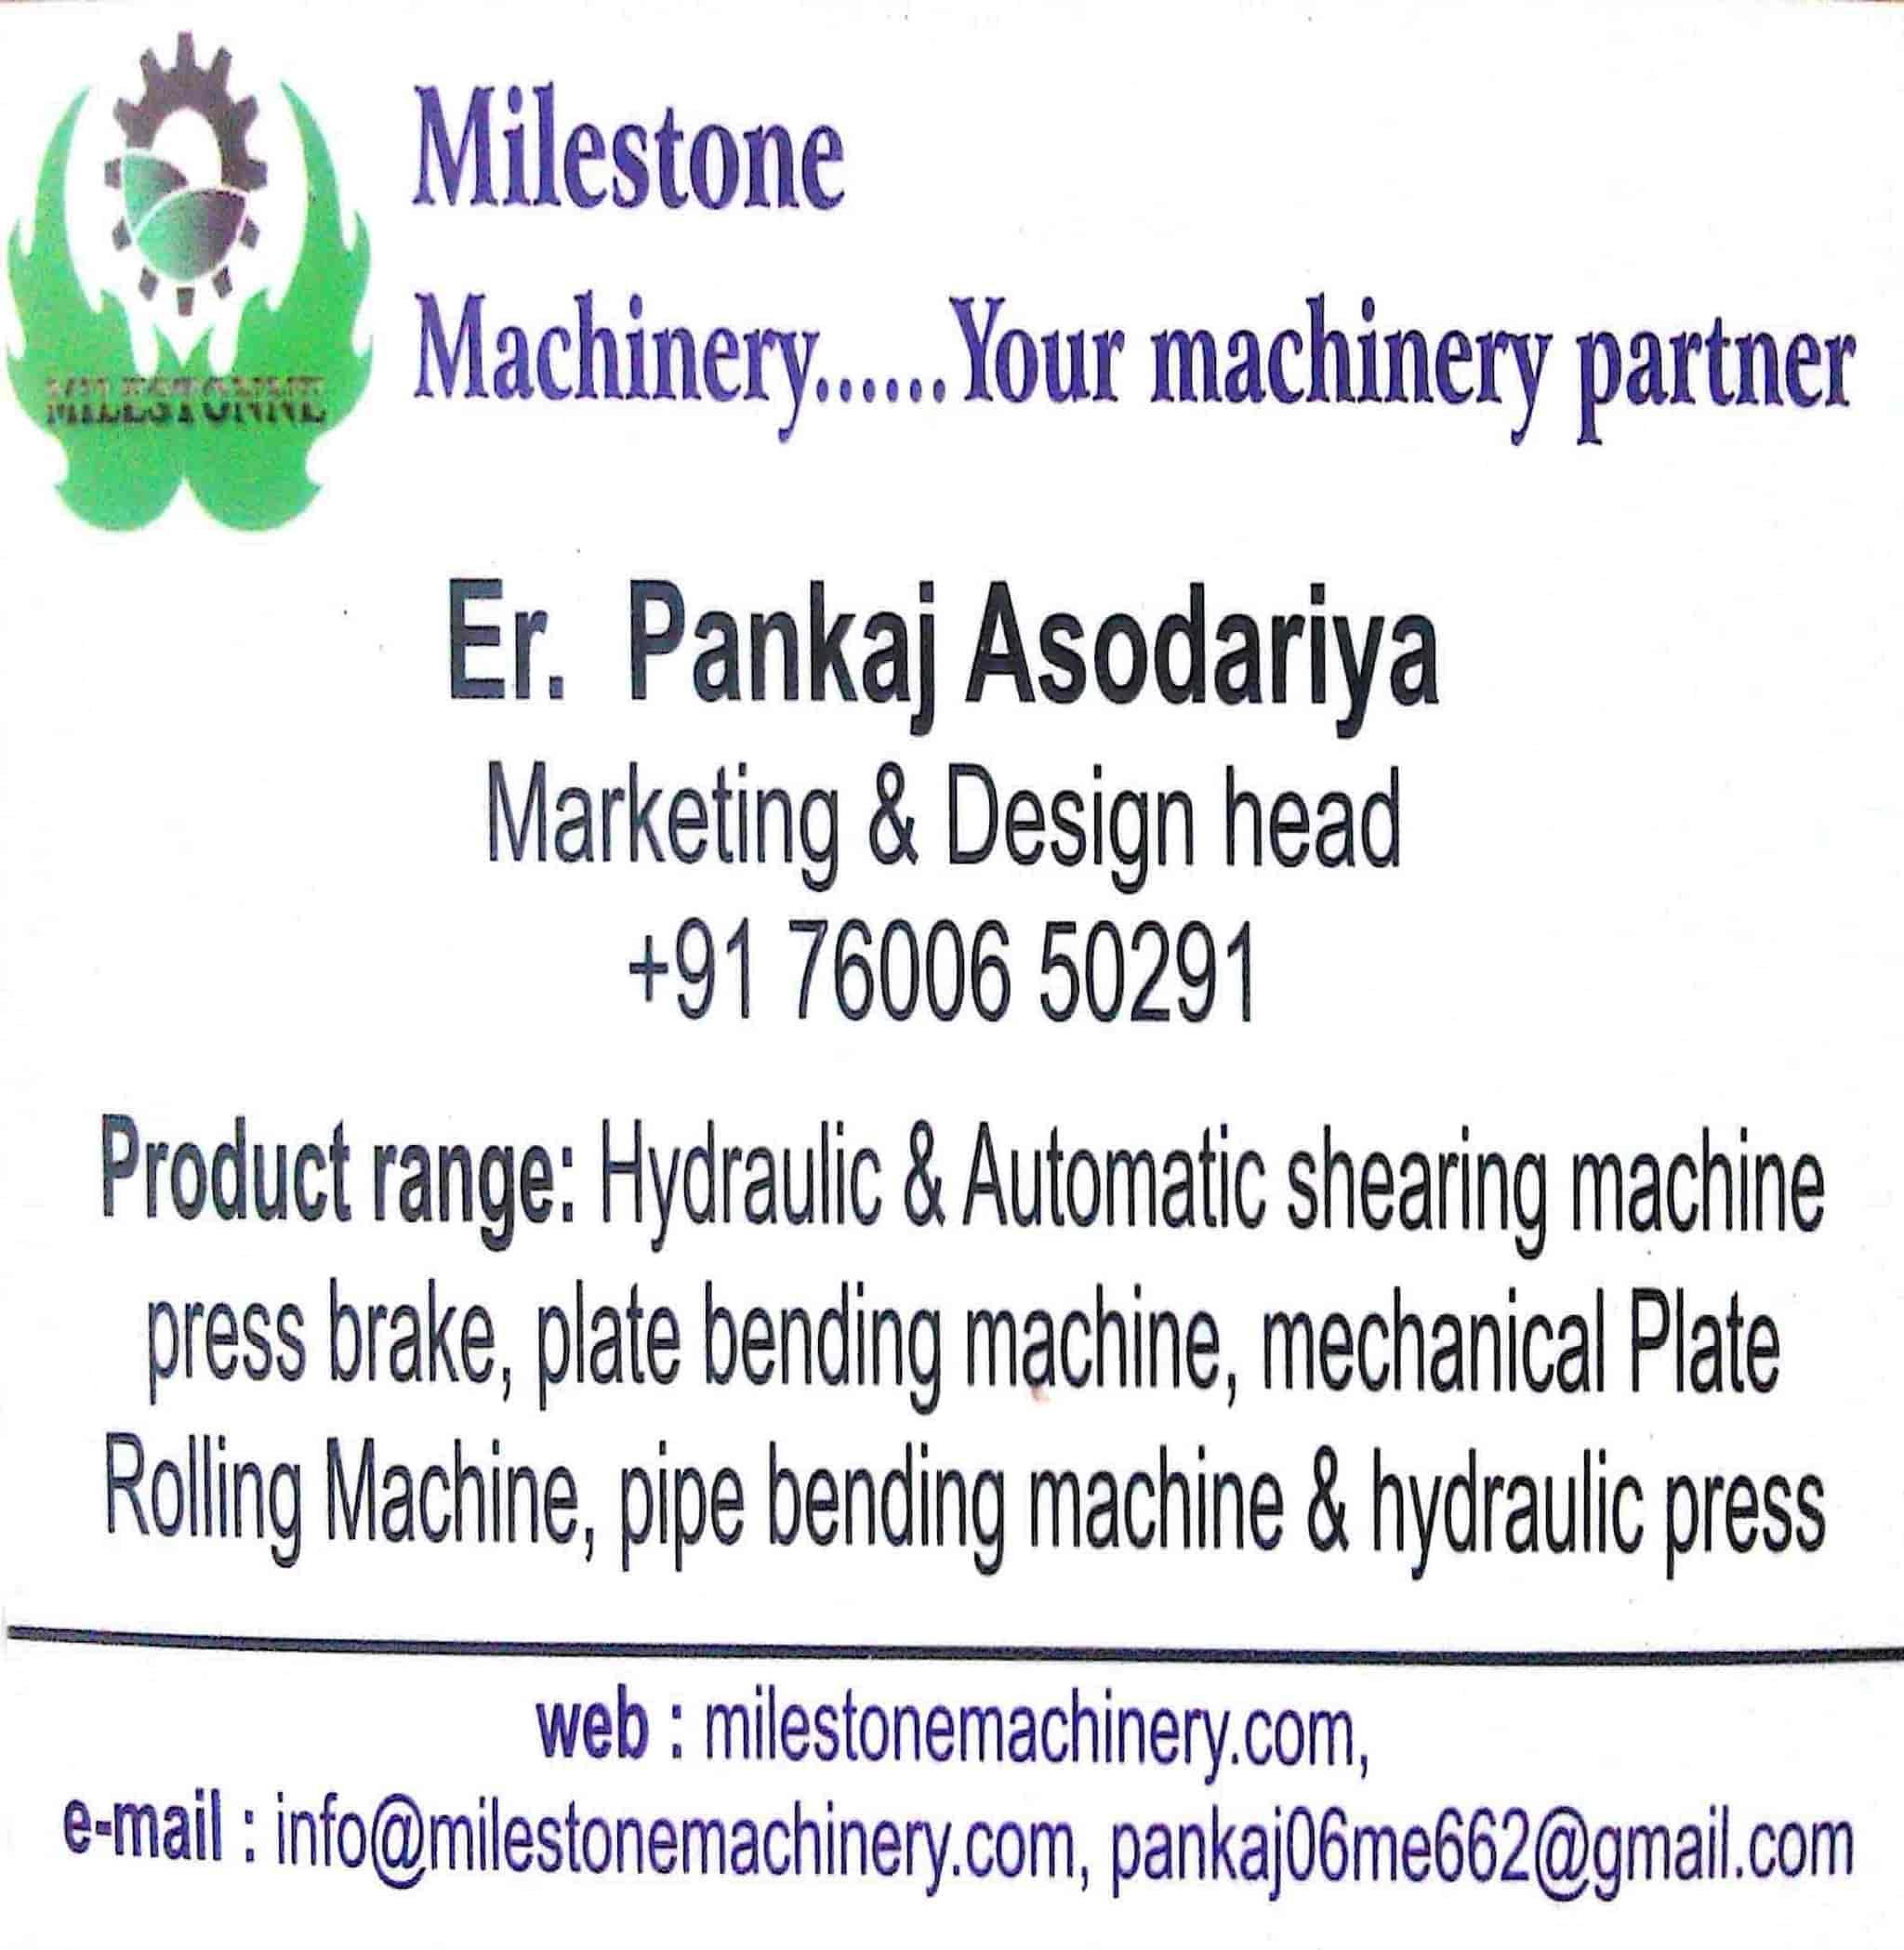 Milestone Machinery Photos, Rajkot City, Rajkot- Pictures